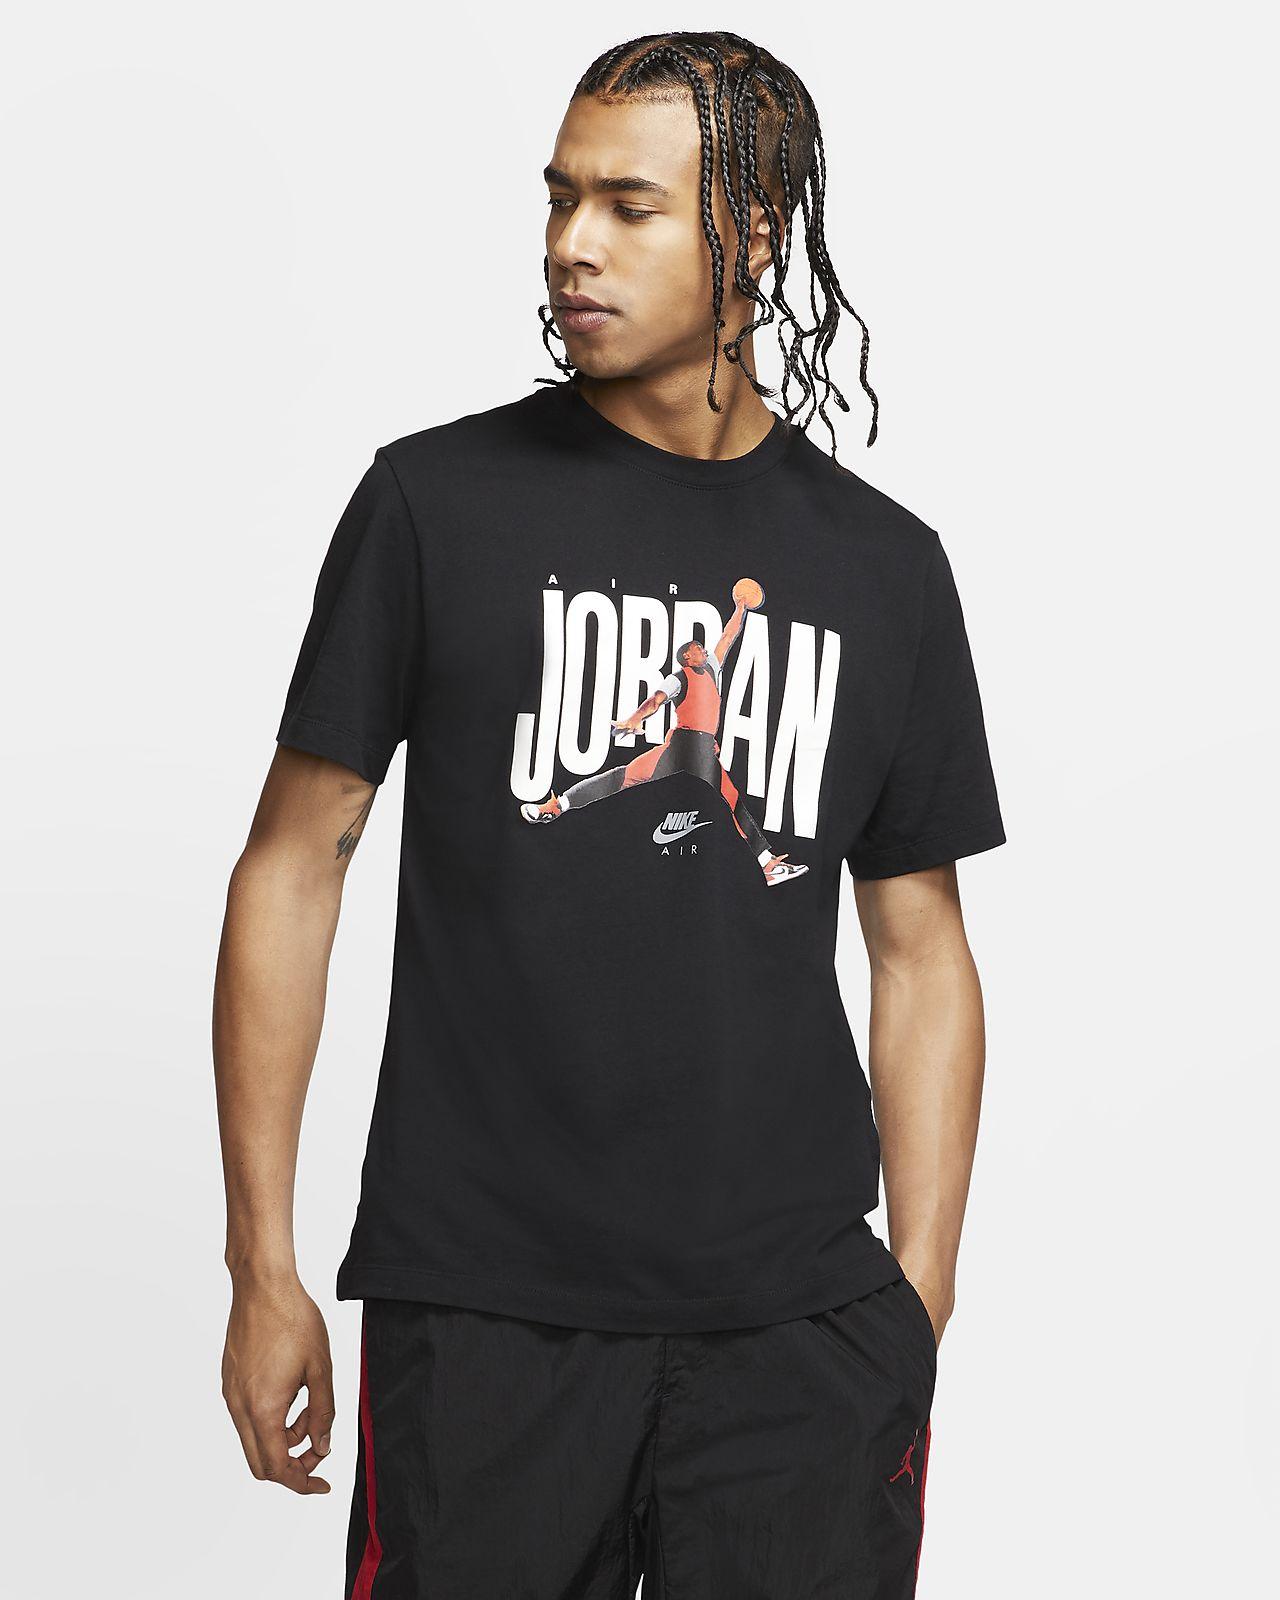 Jordan Men's Short-Sleeve Crew